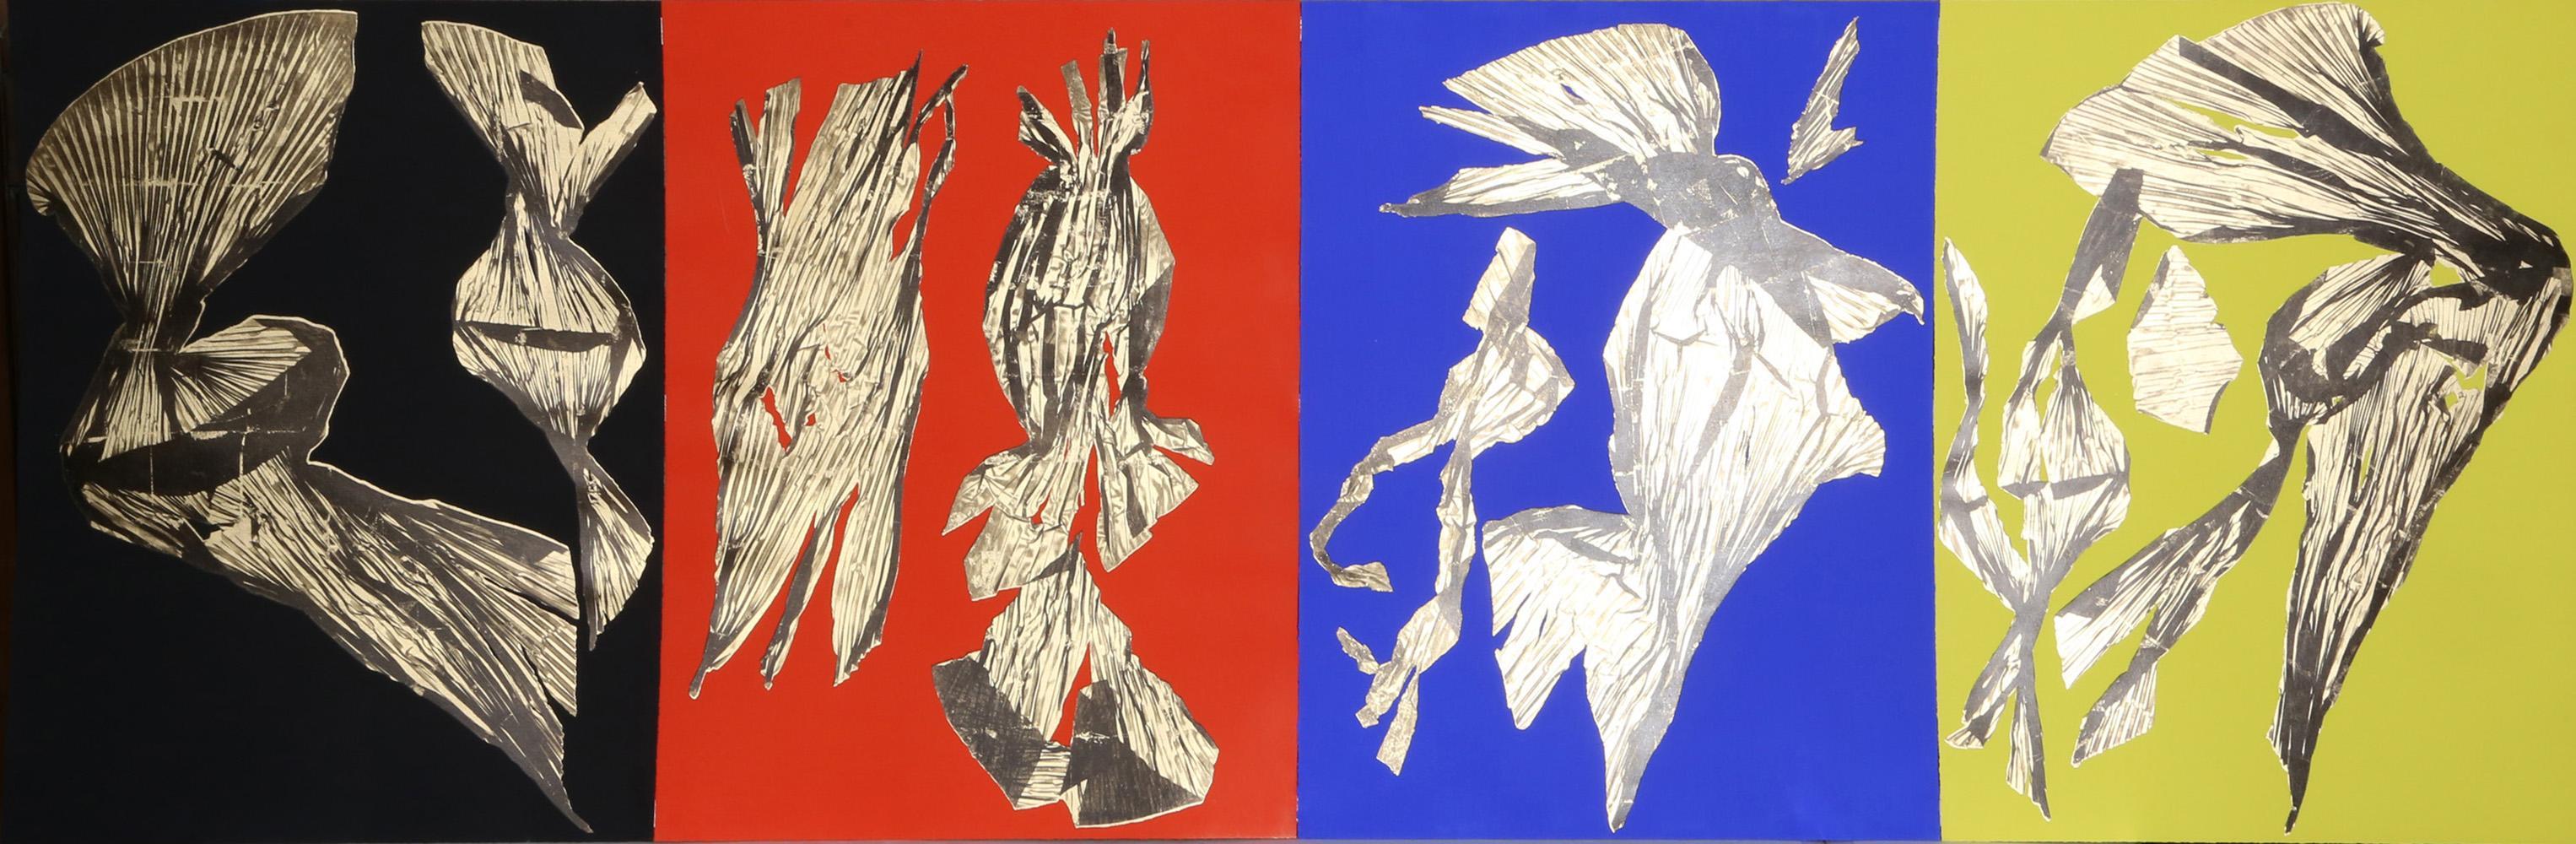 Lynda Benglis, Dual Nature (Quad), Four Lithographs with Gold Leaf